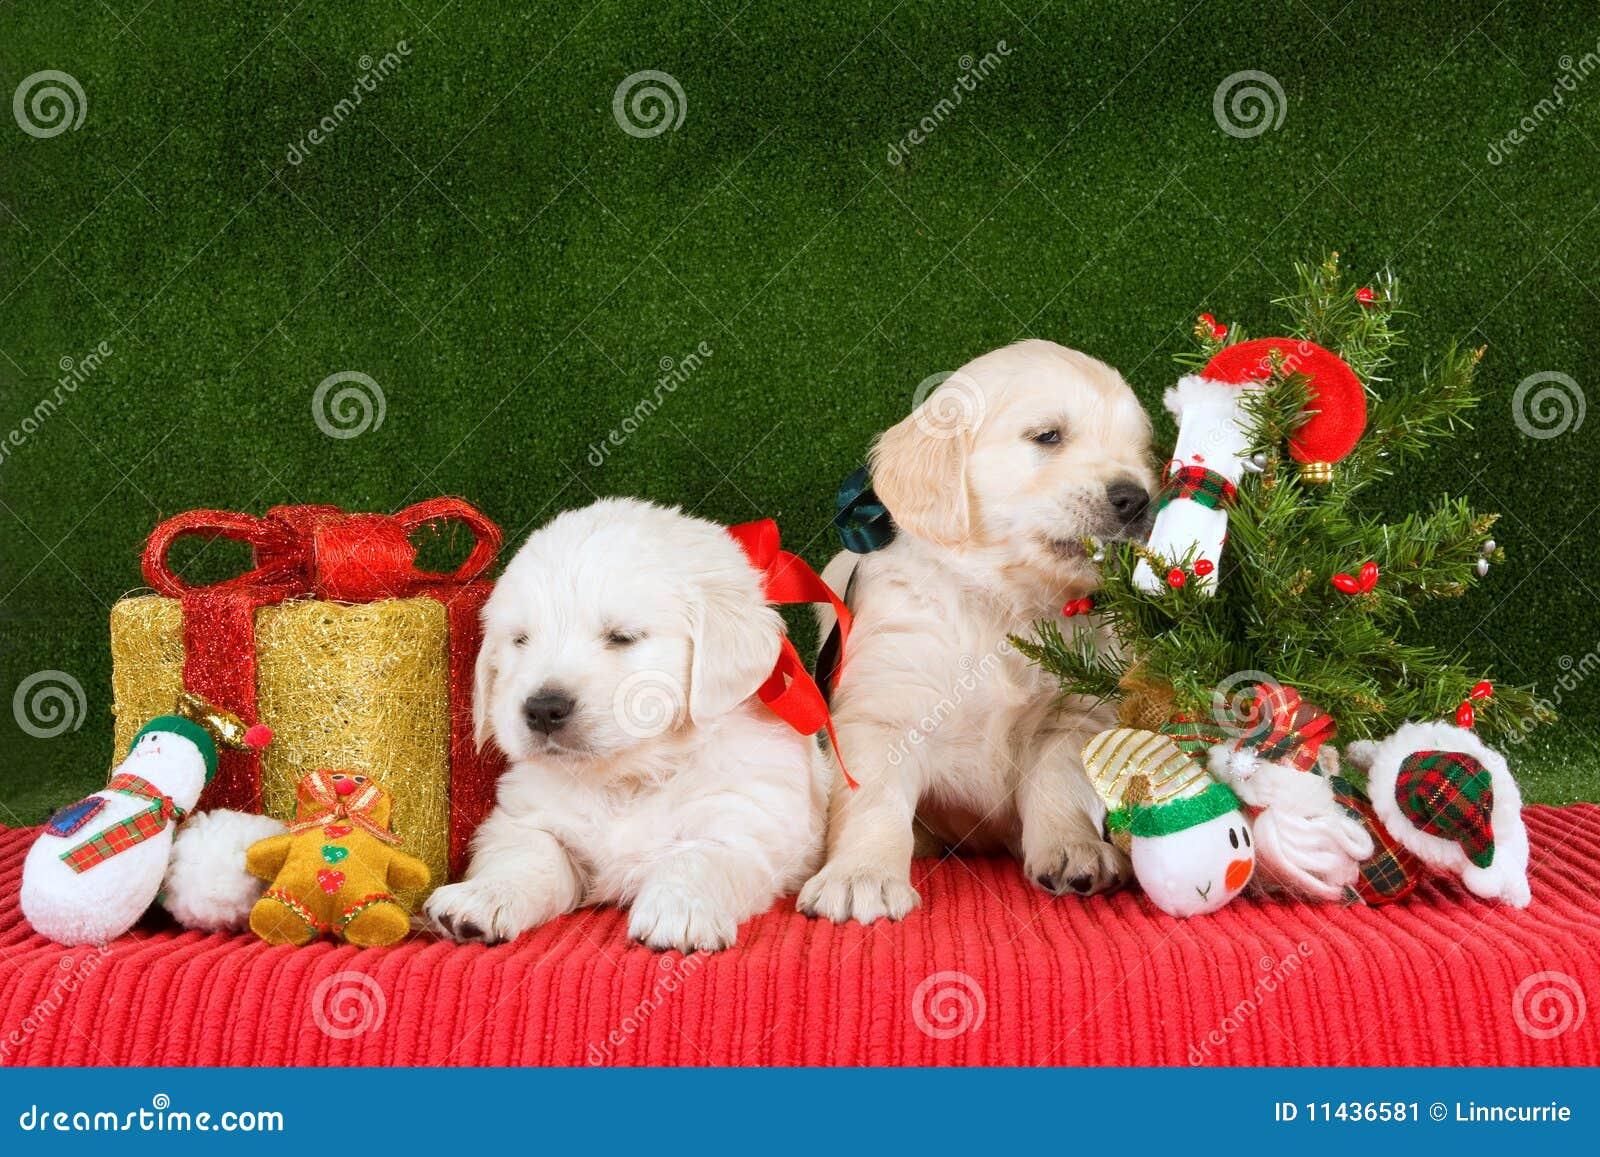 Golden Retriever Puppies With Xmas Tree Stock Image Image Of